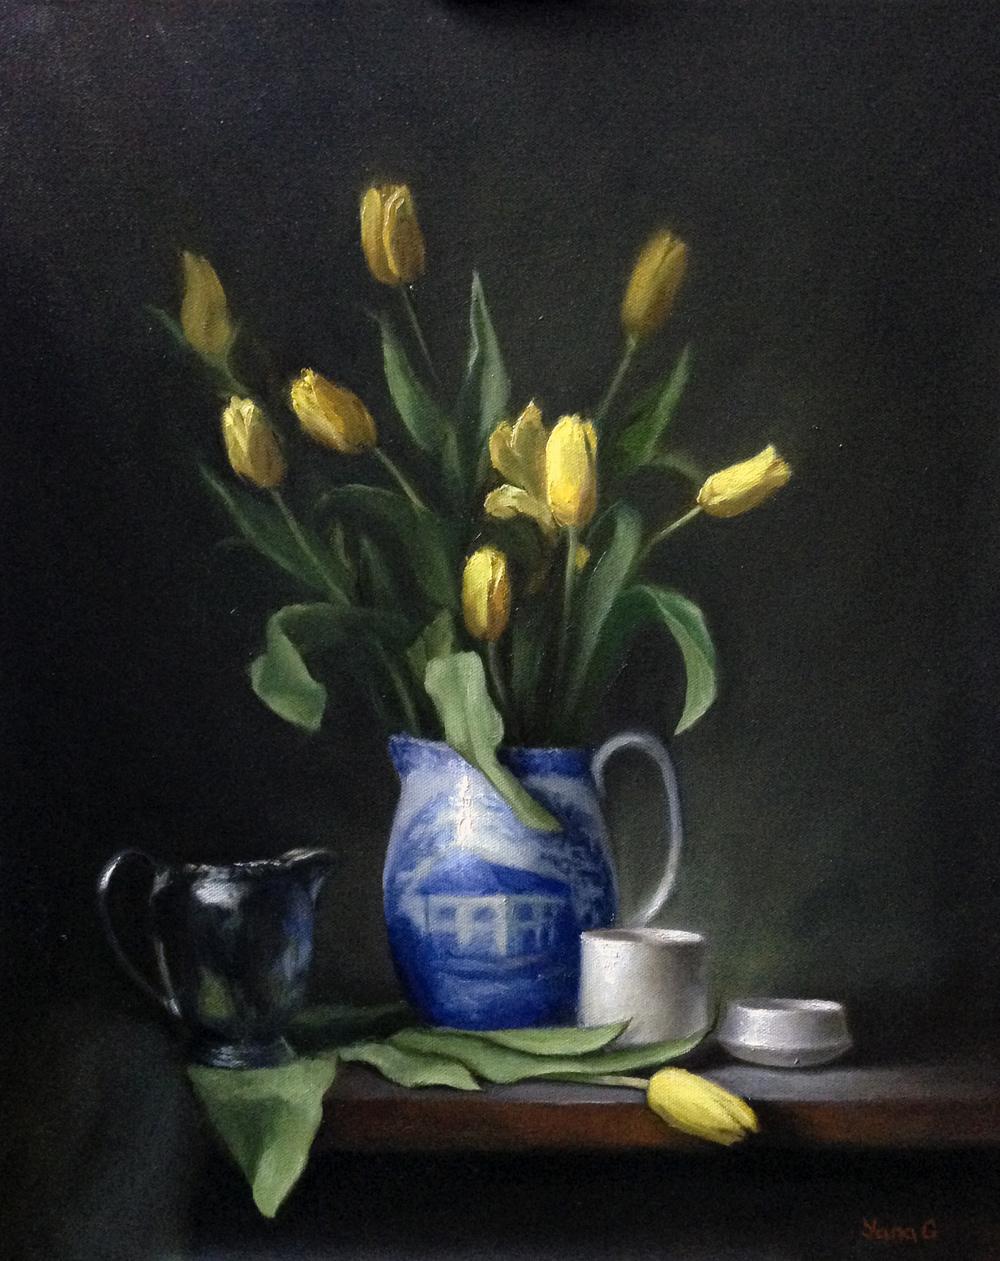 Yellow Tulips 16x20 Oil on canvas NFS